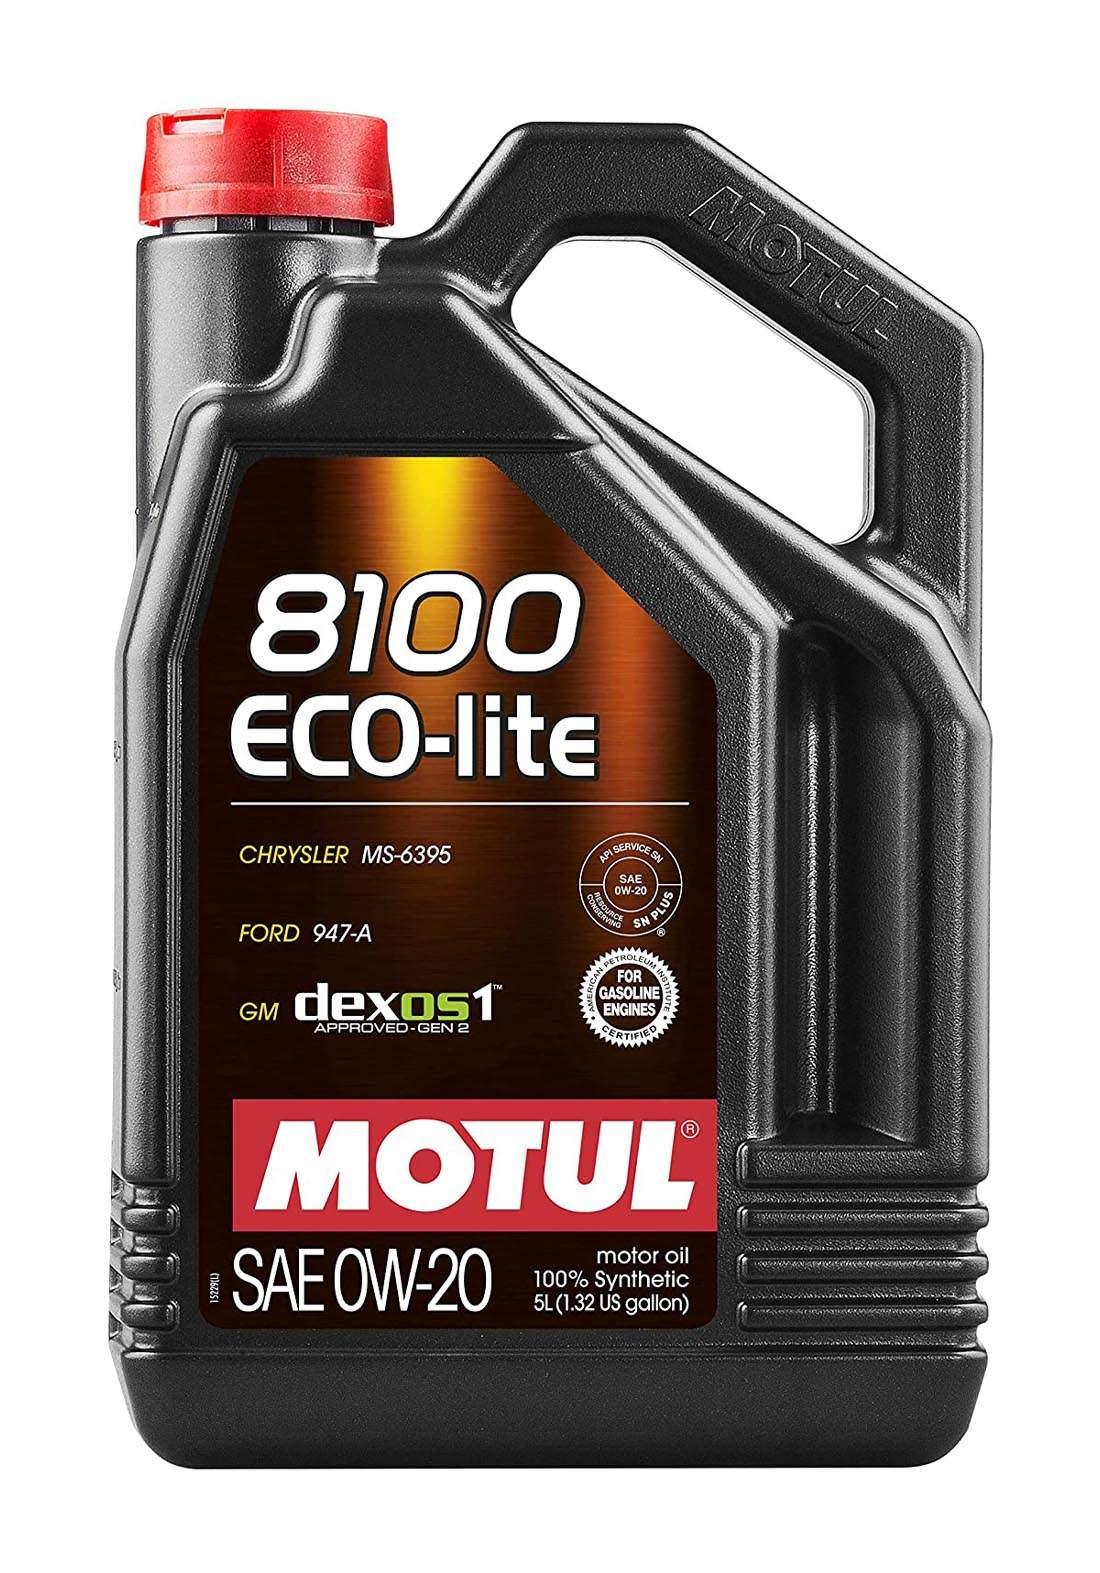 Motul 5w20 Eco-lite 8100 100% Synthetic oil 5L  زيت تخليقي 100% للسيارات